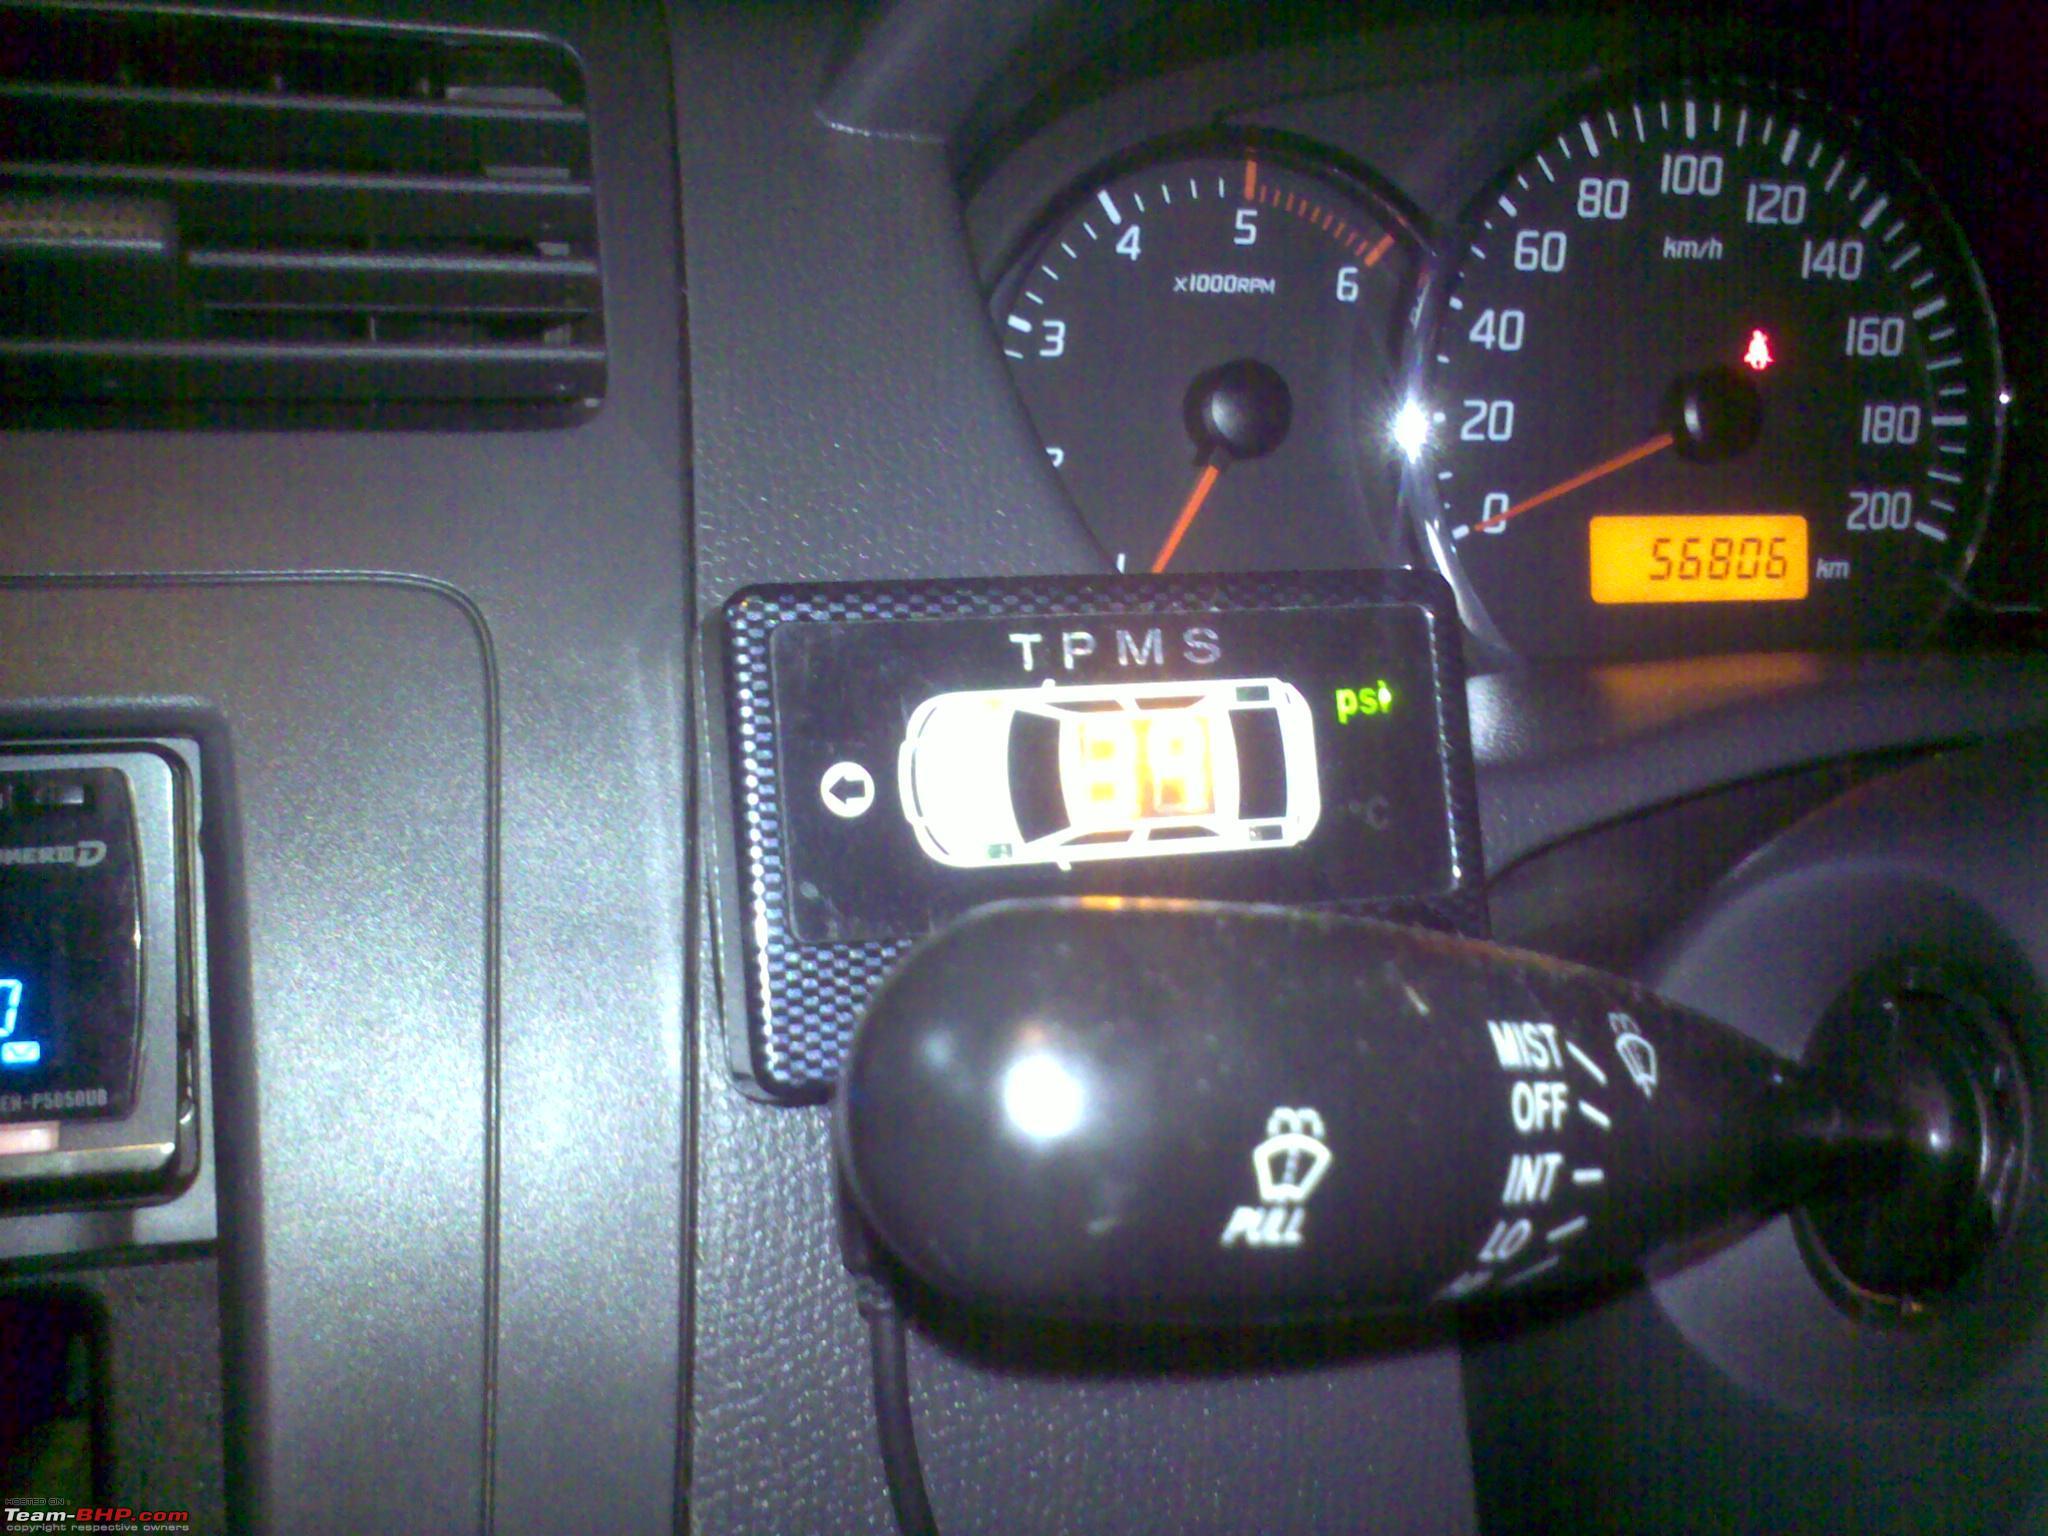 Tpms tyre pressure monitoring system by tyreprobe 02012010007 jpg